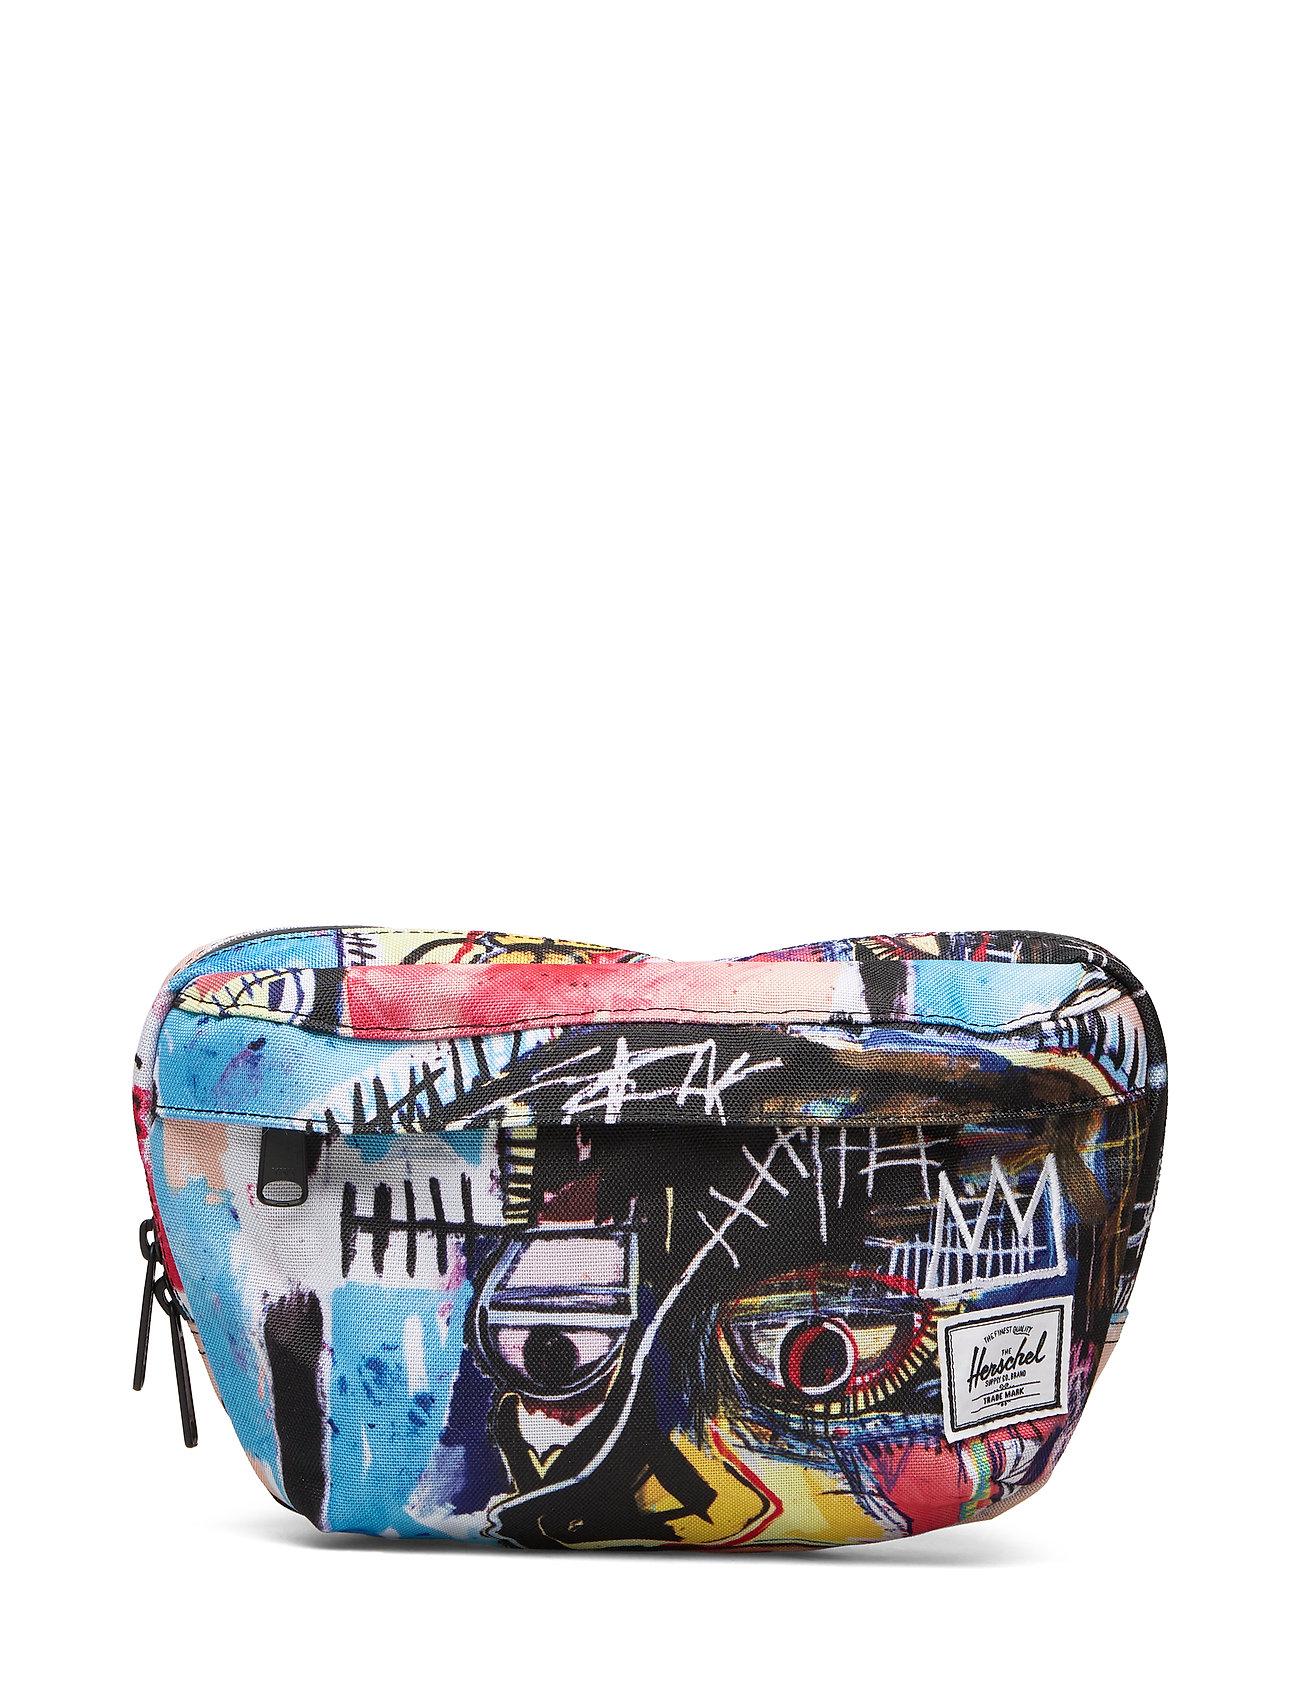 Image of Nineteen-Basquiat Skull Bum Bag Taske Multi/mønstret Herschel (3406239939)